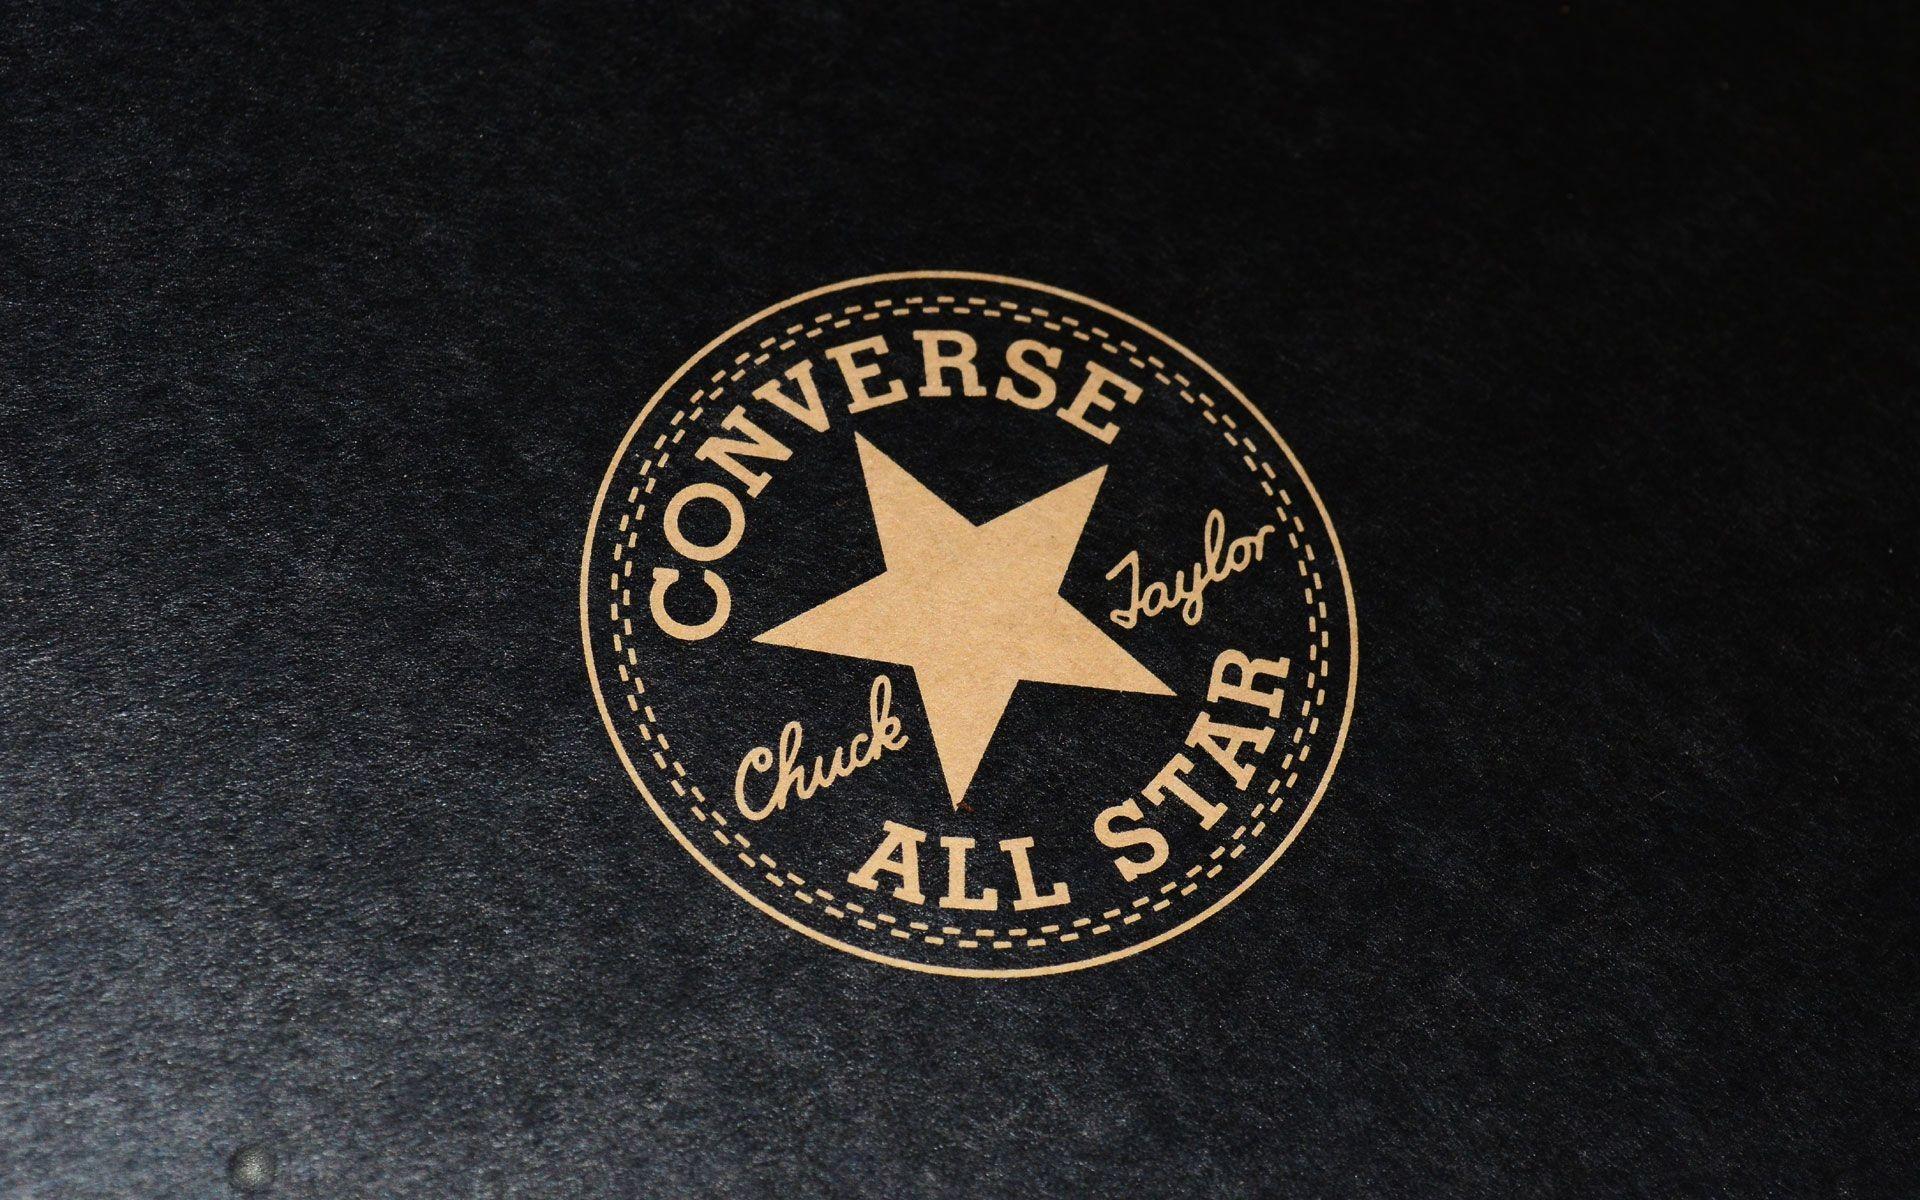 Black Converse All Star Logo On Box Picture Gallery Image Wallpaper HD  Widescreen Desktop